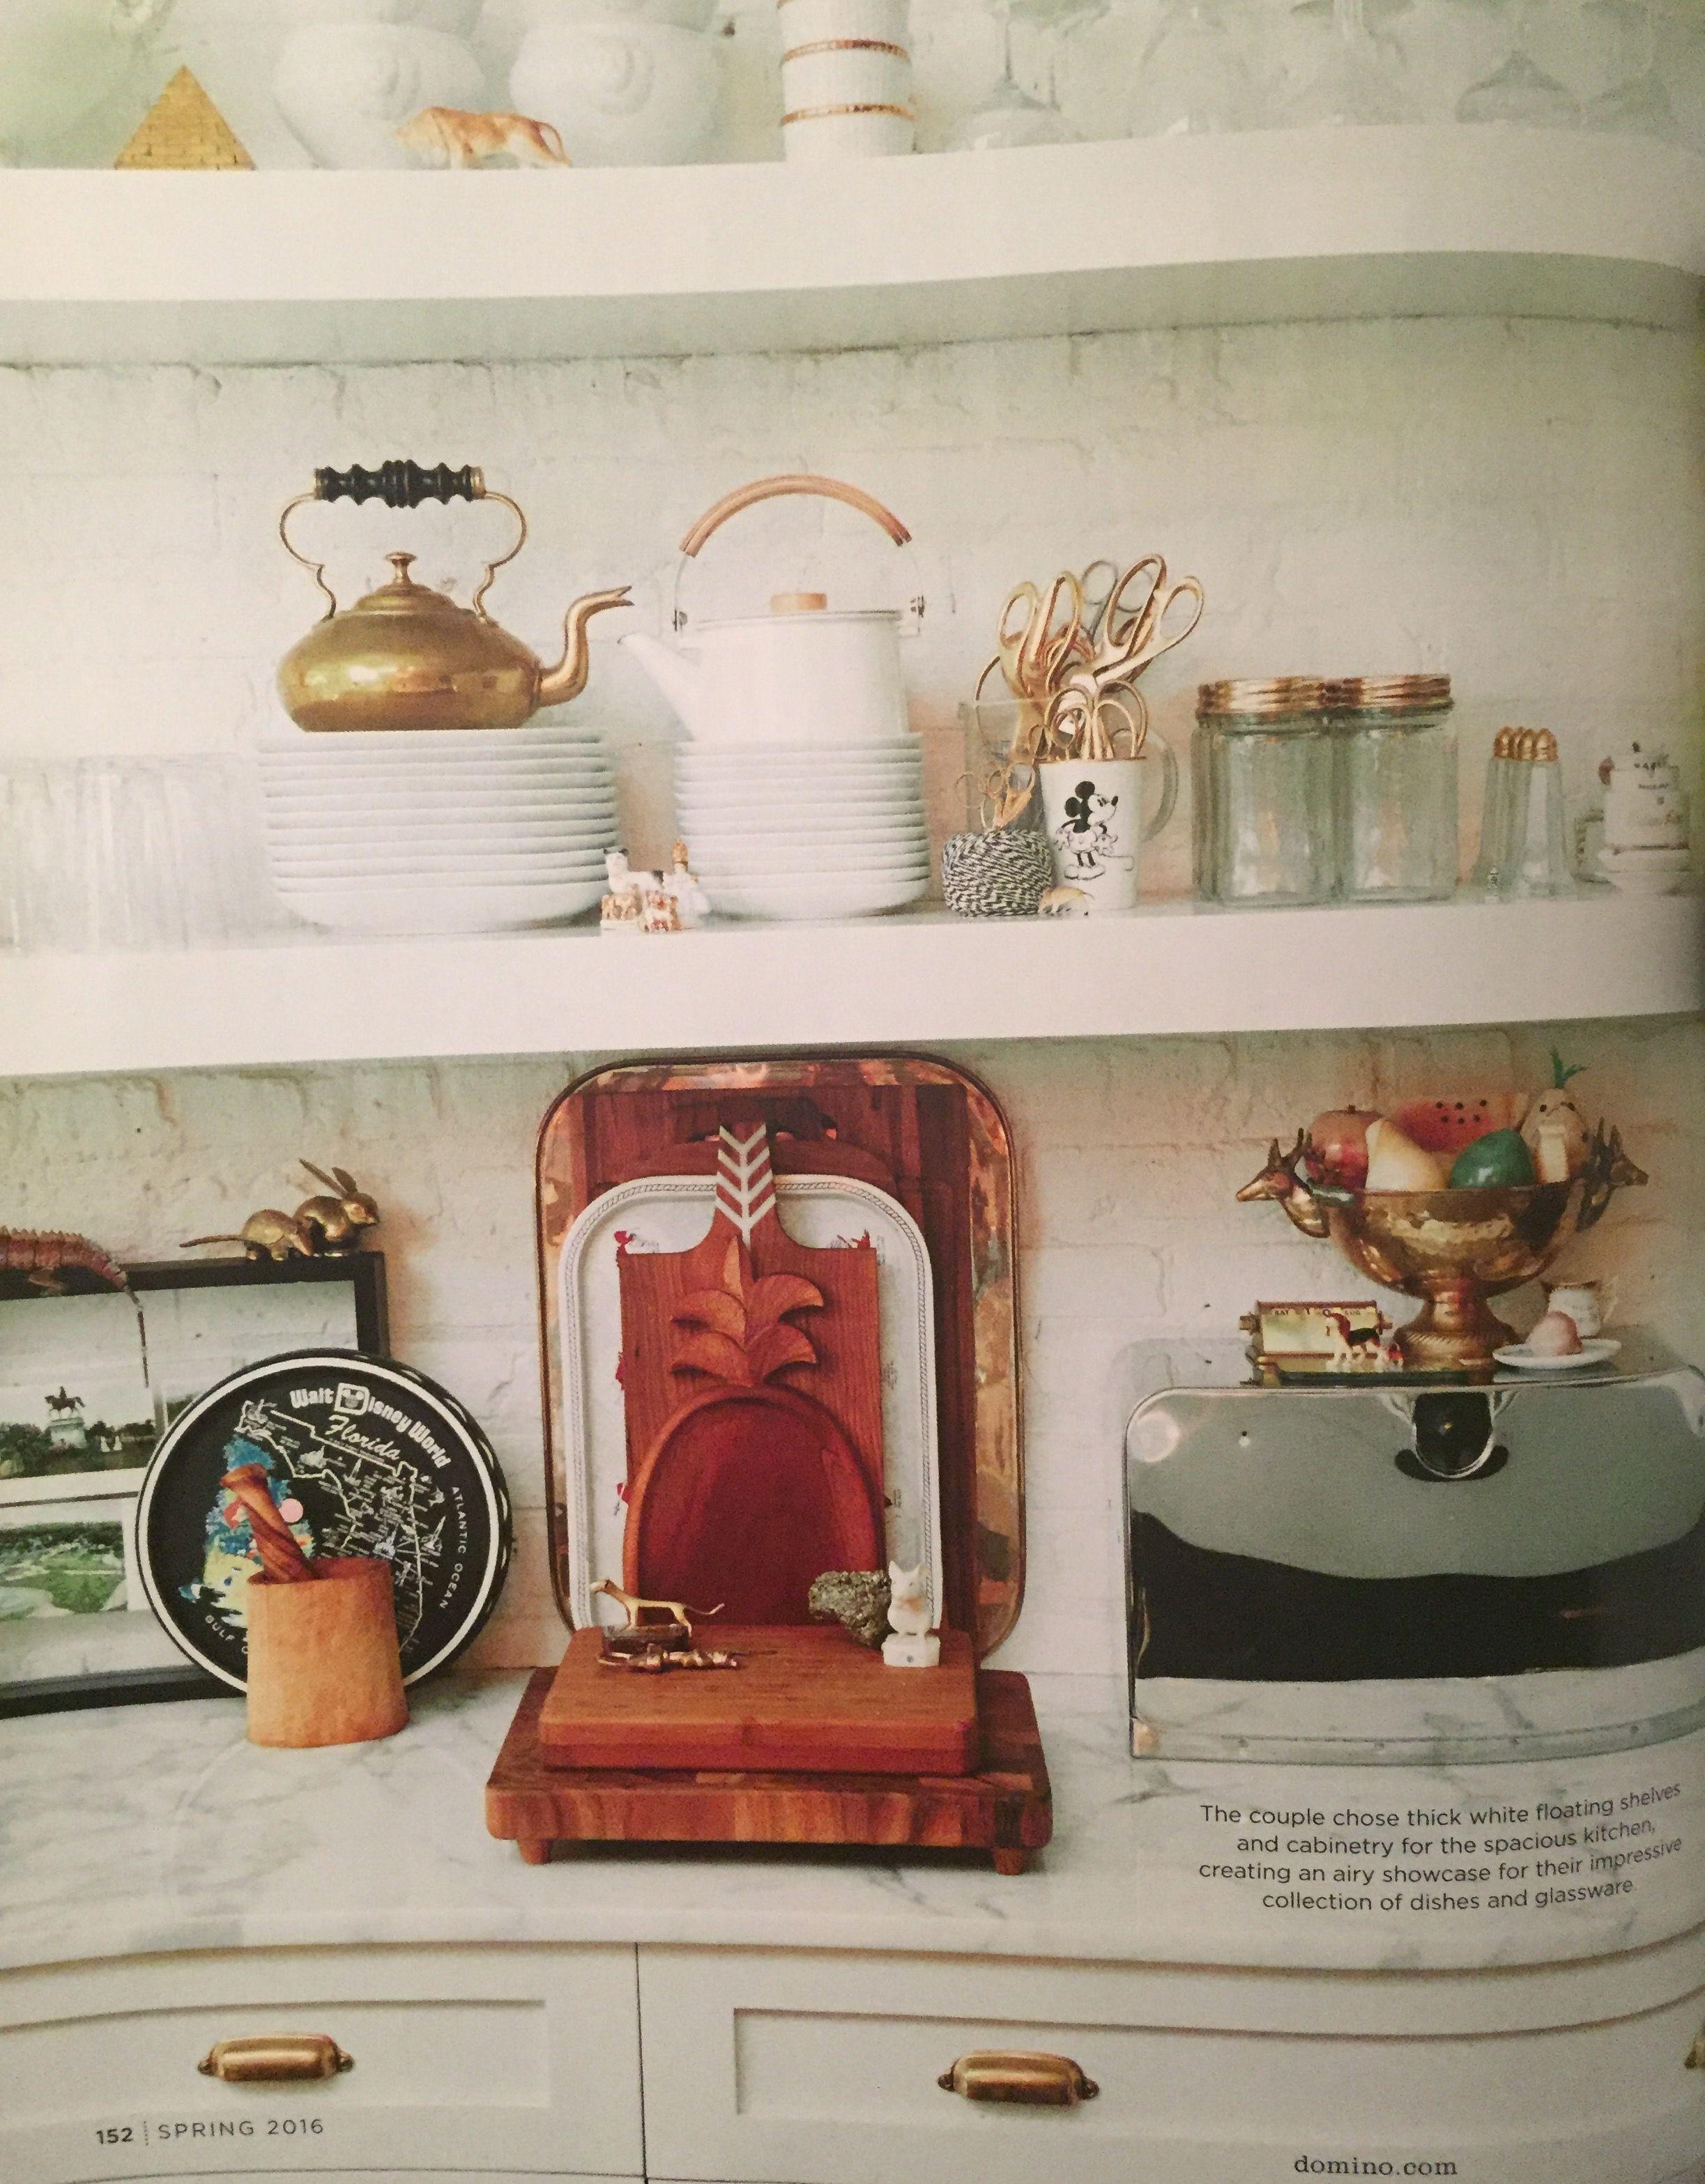 pin by deborah gatica on shelves home decor bohemian kitchen decor on boho chic kitchen table ideas id=63633